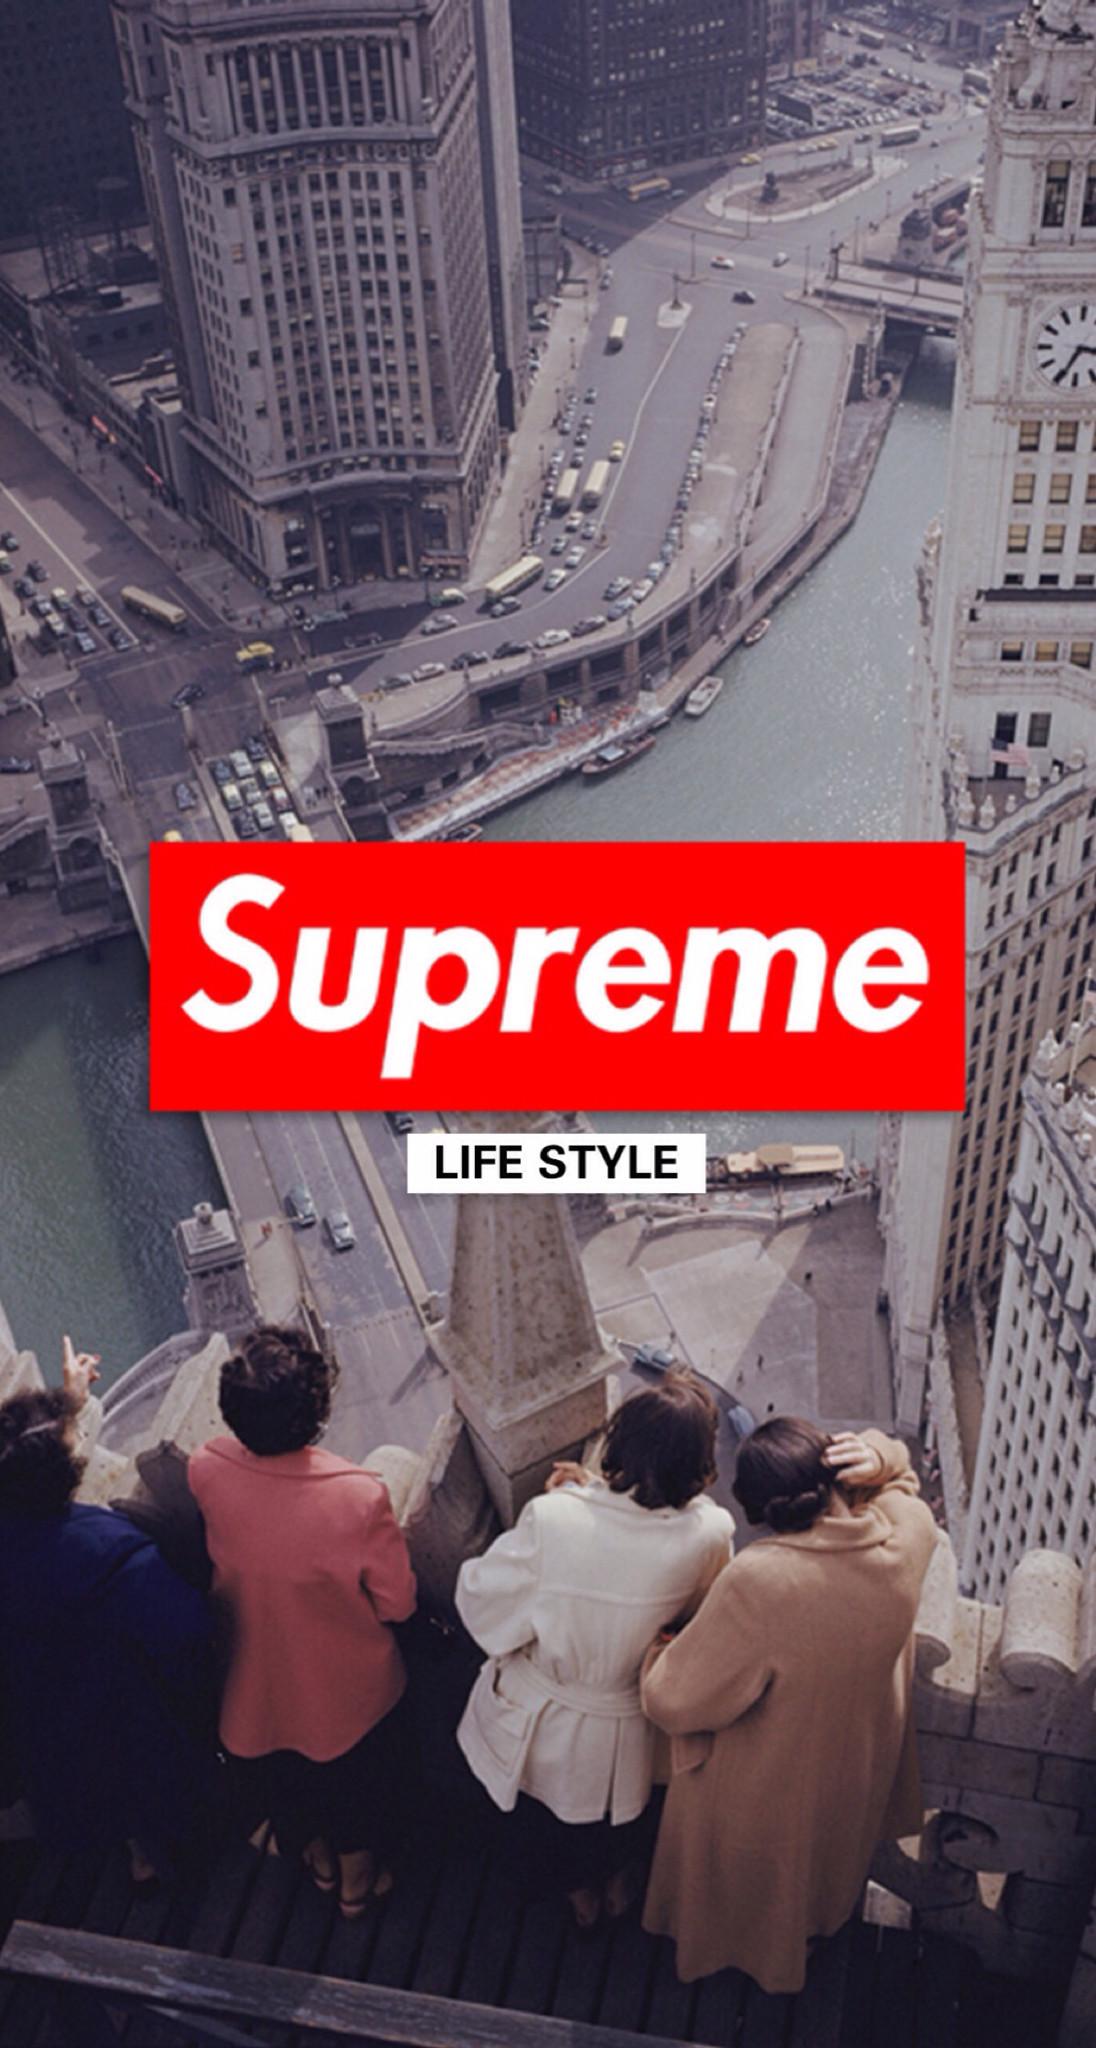 Supreme x Life Style